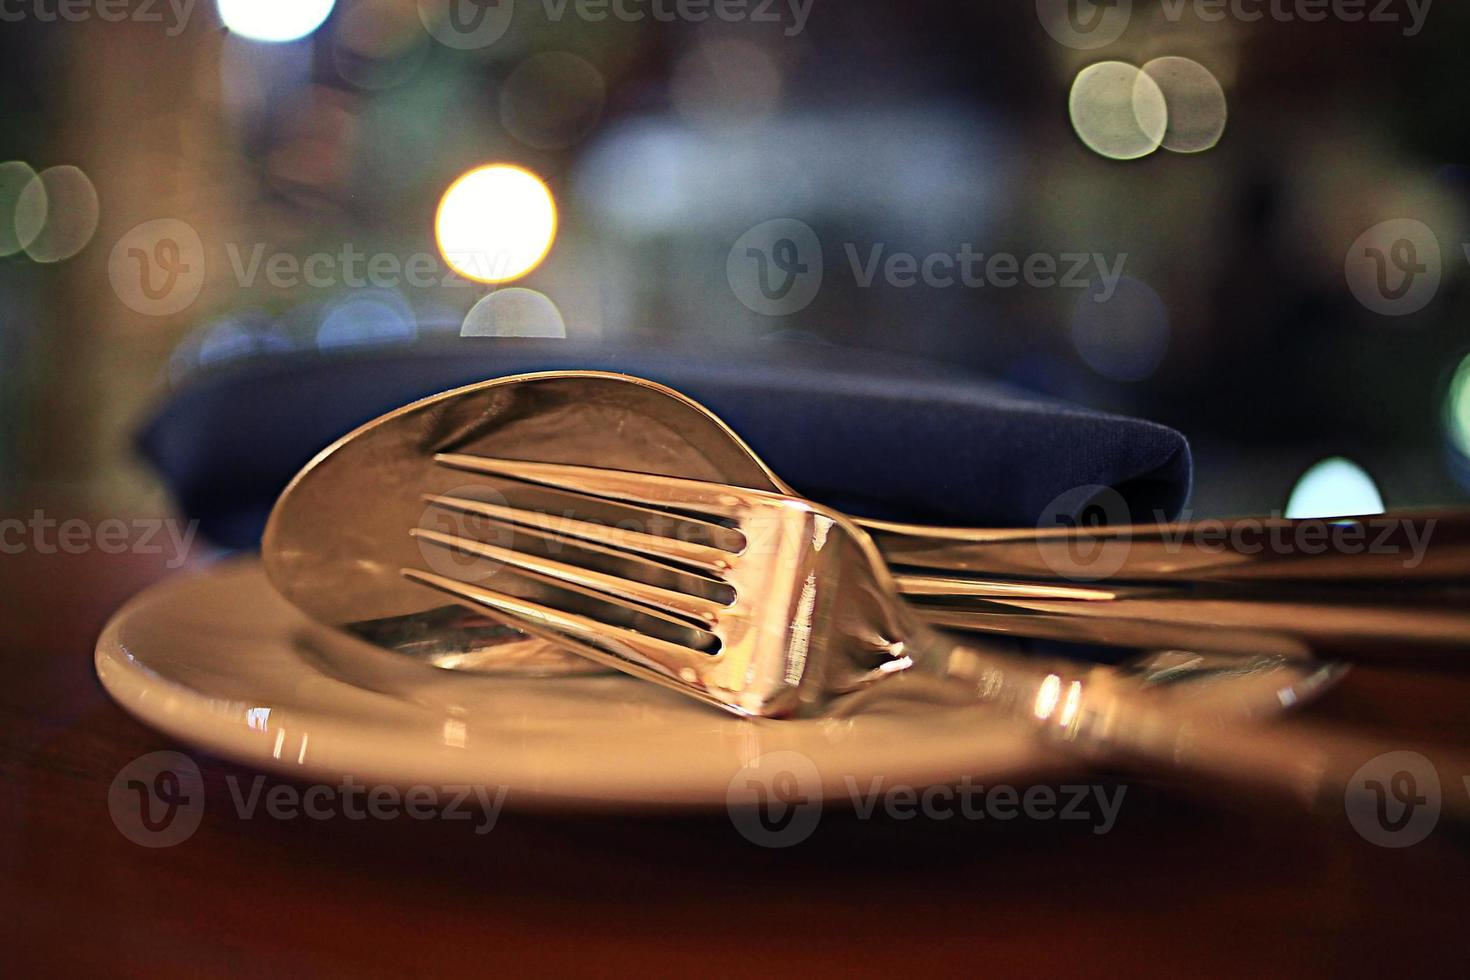 mat i restaurangen, bord, bakgrund foto